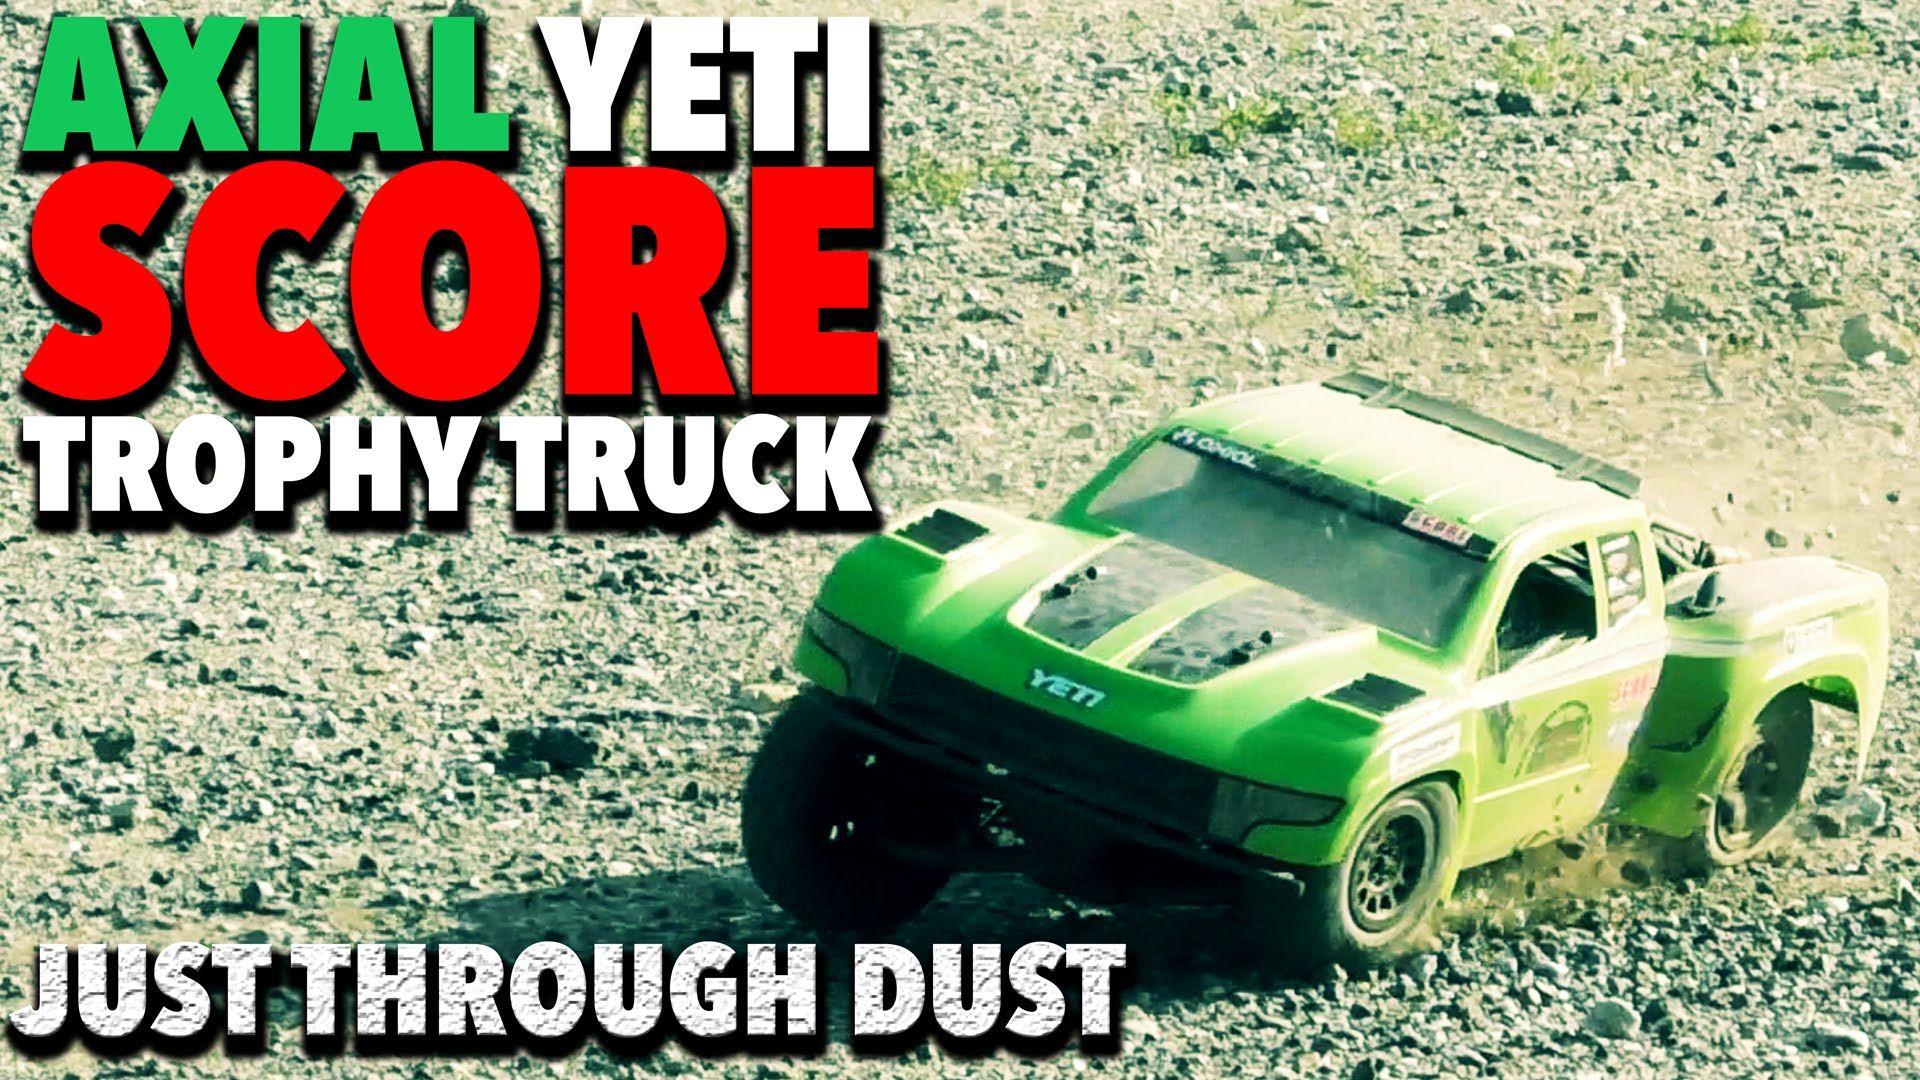 Axial Yeti Score Trophy Truck Just Through Dust Slow Mo Trophy Truck Trophy Trucks